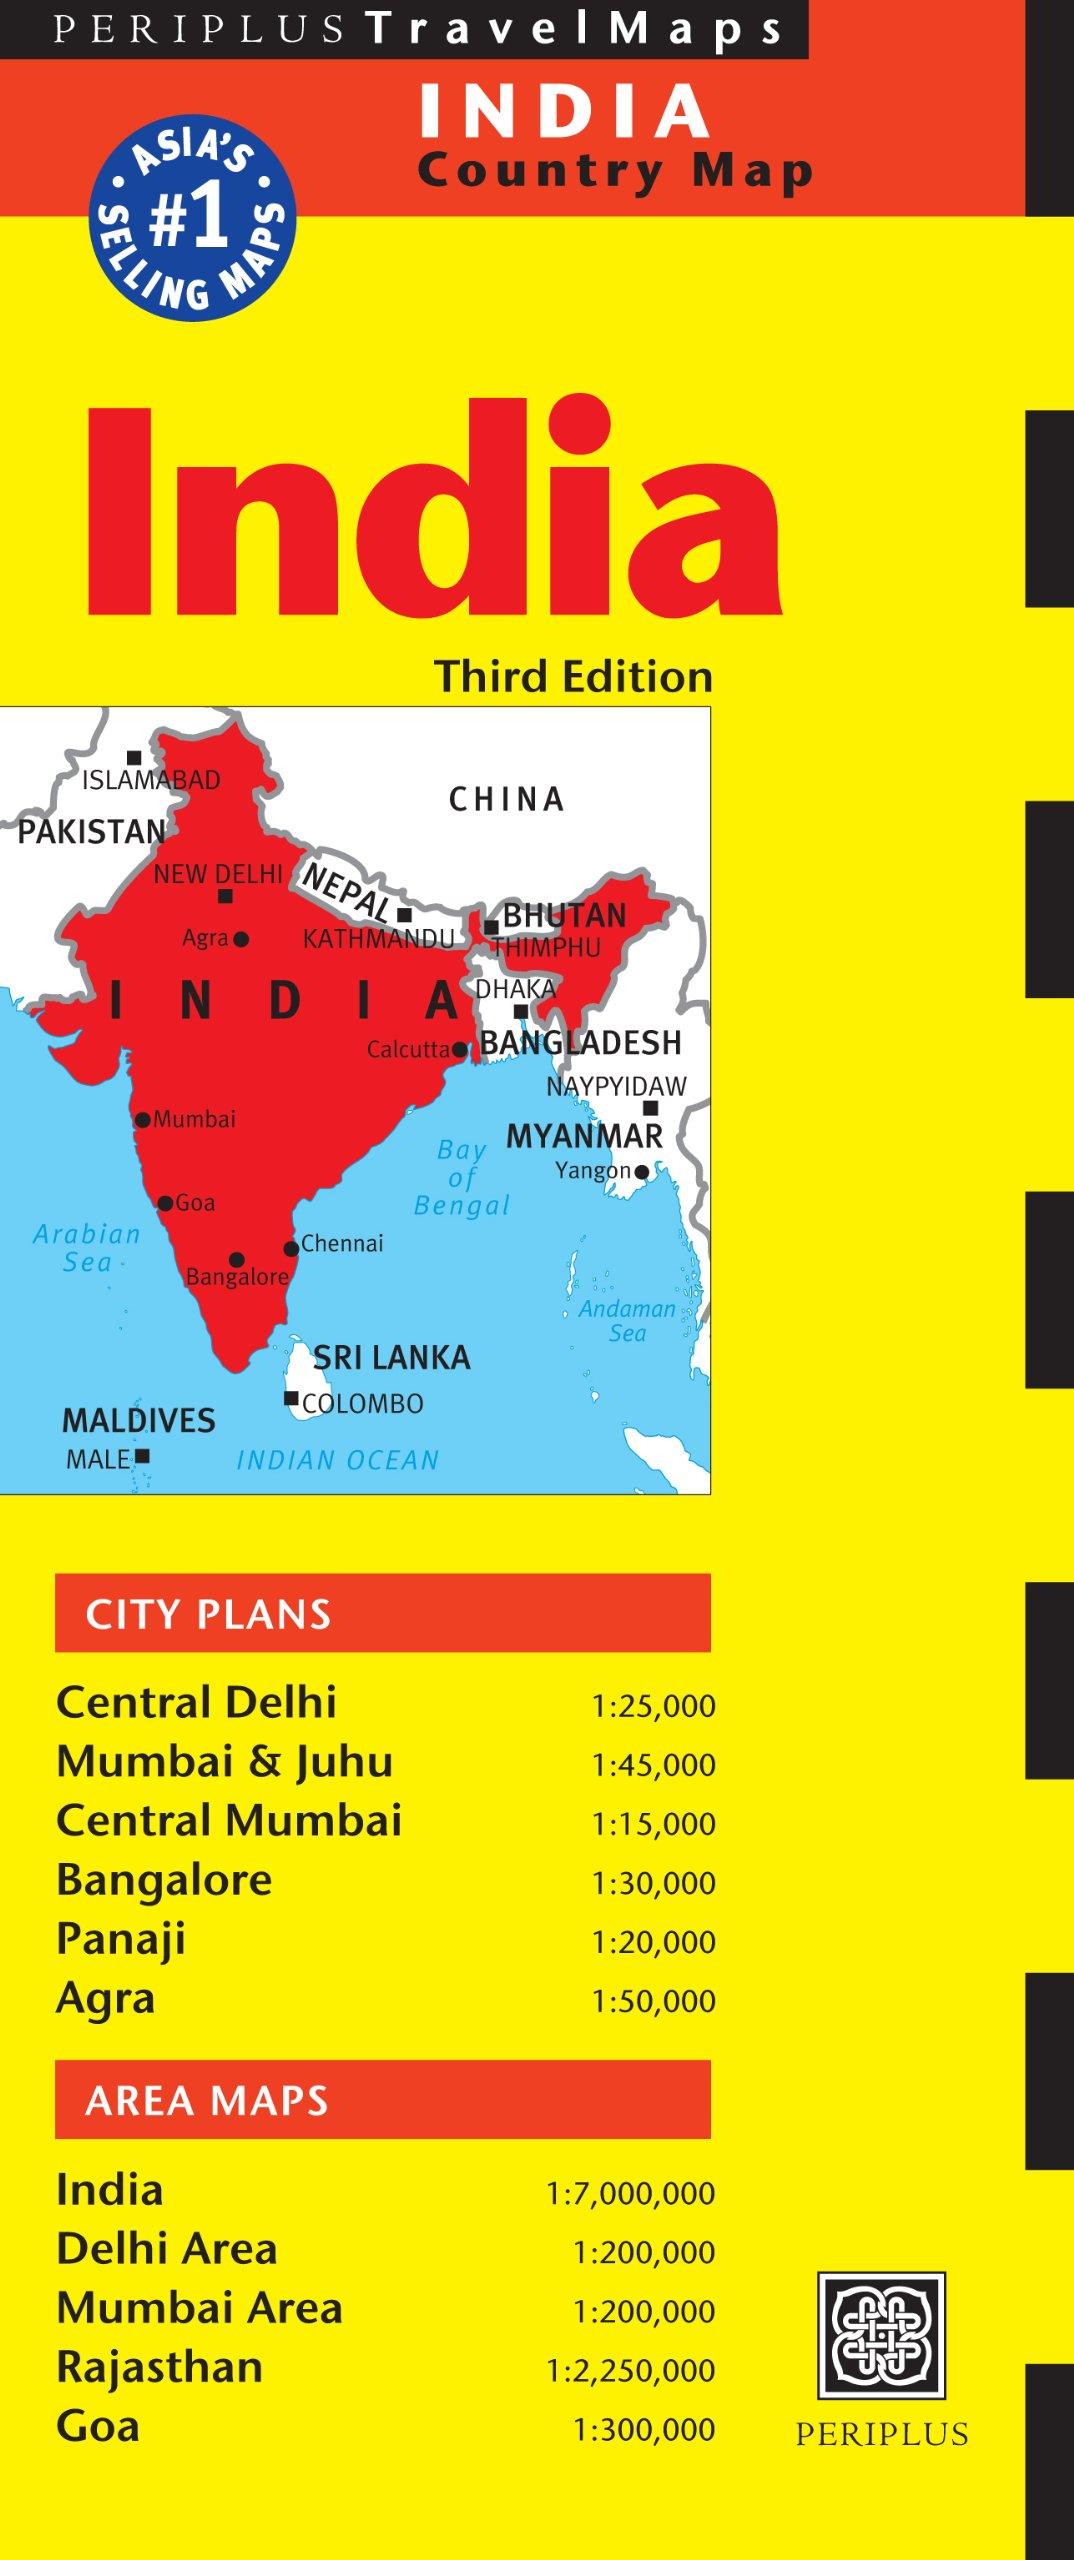 India Travel Map Periplus Travel Maps Amazon Co Uk Periplus